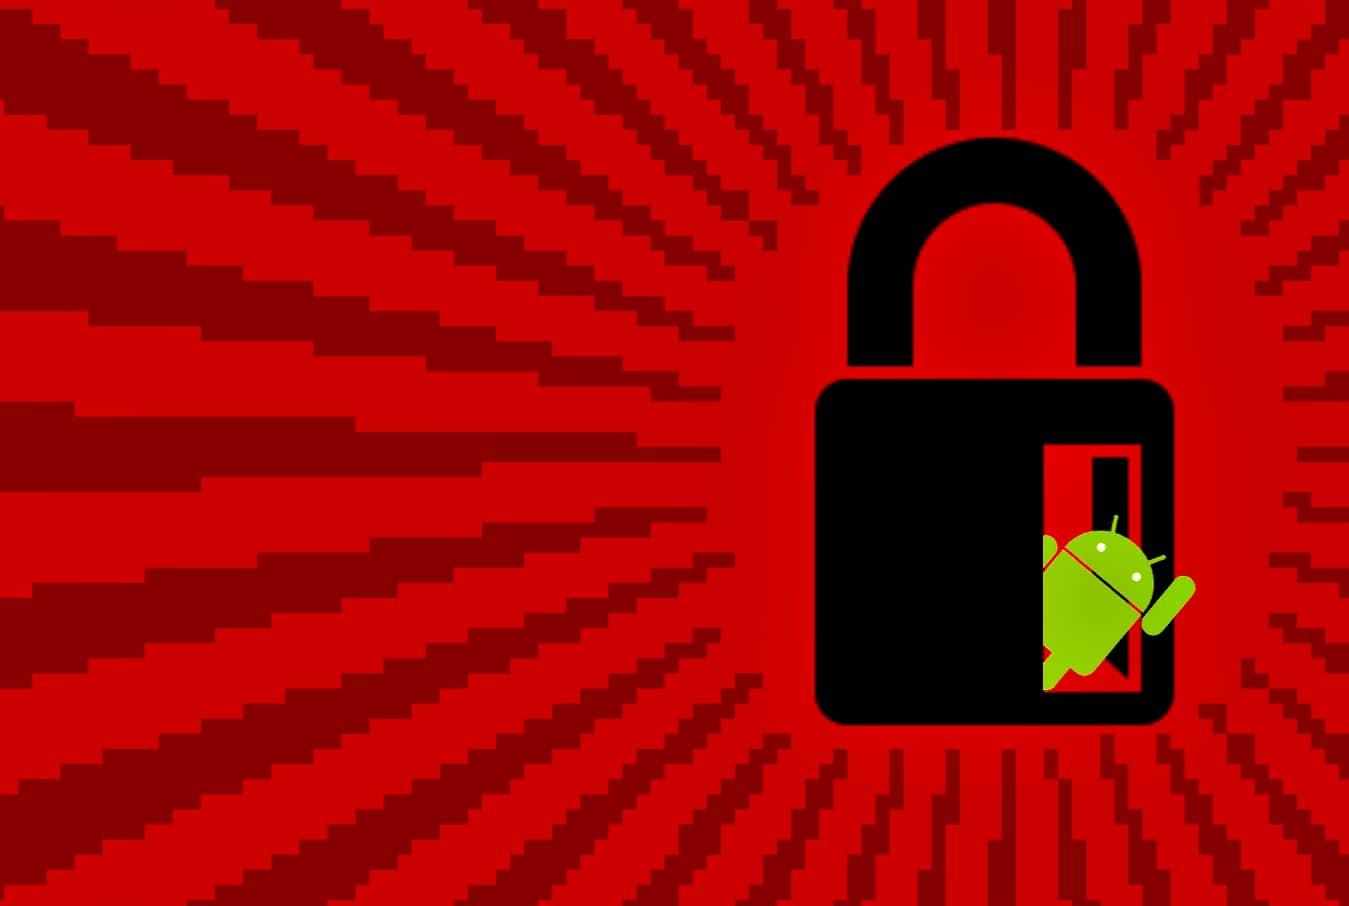 Google confirms presence of Triada backdoor in cheap Android